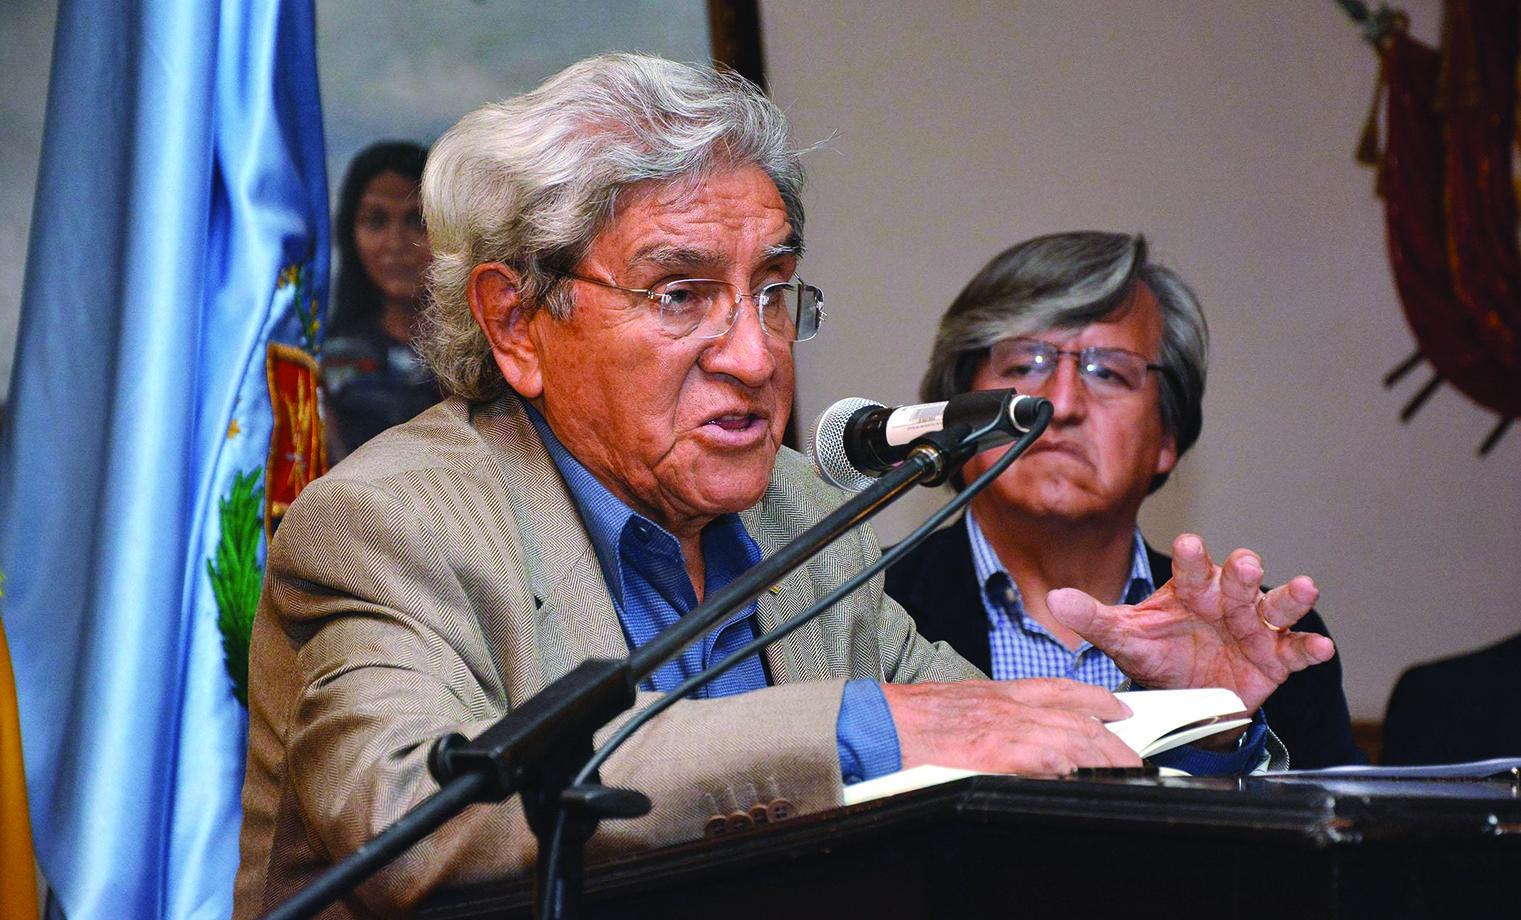 poeta y compositor Jorge Mansilla